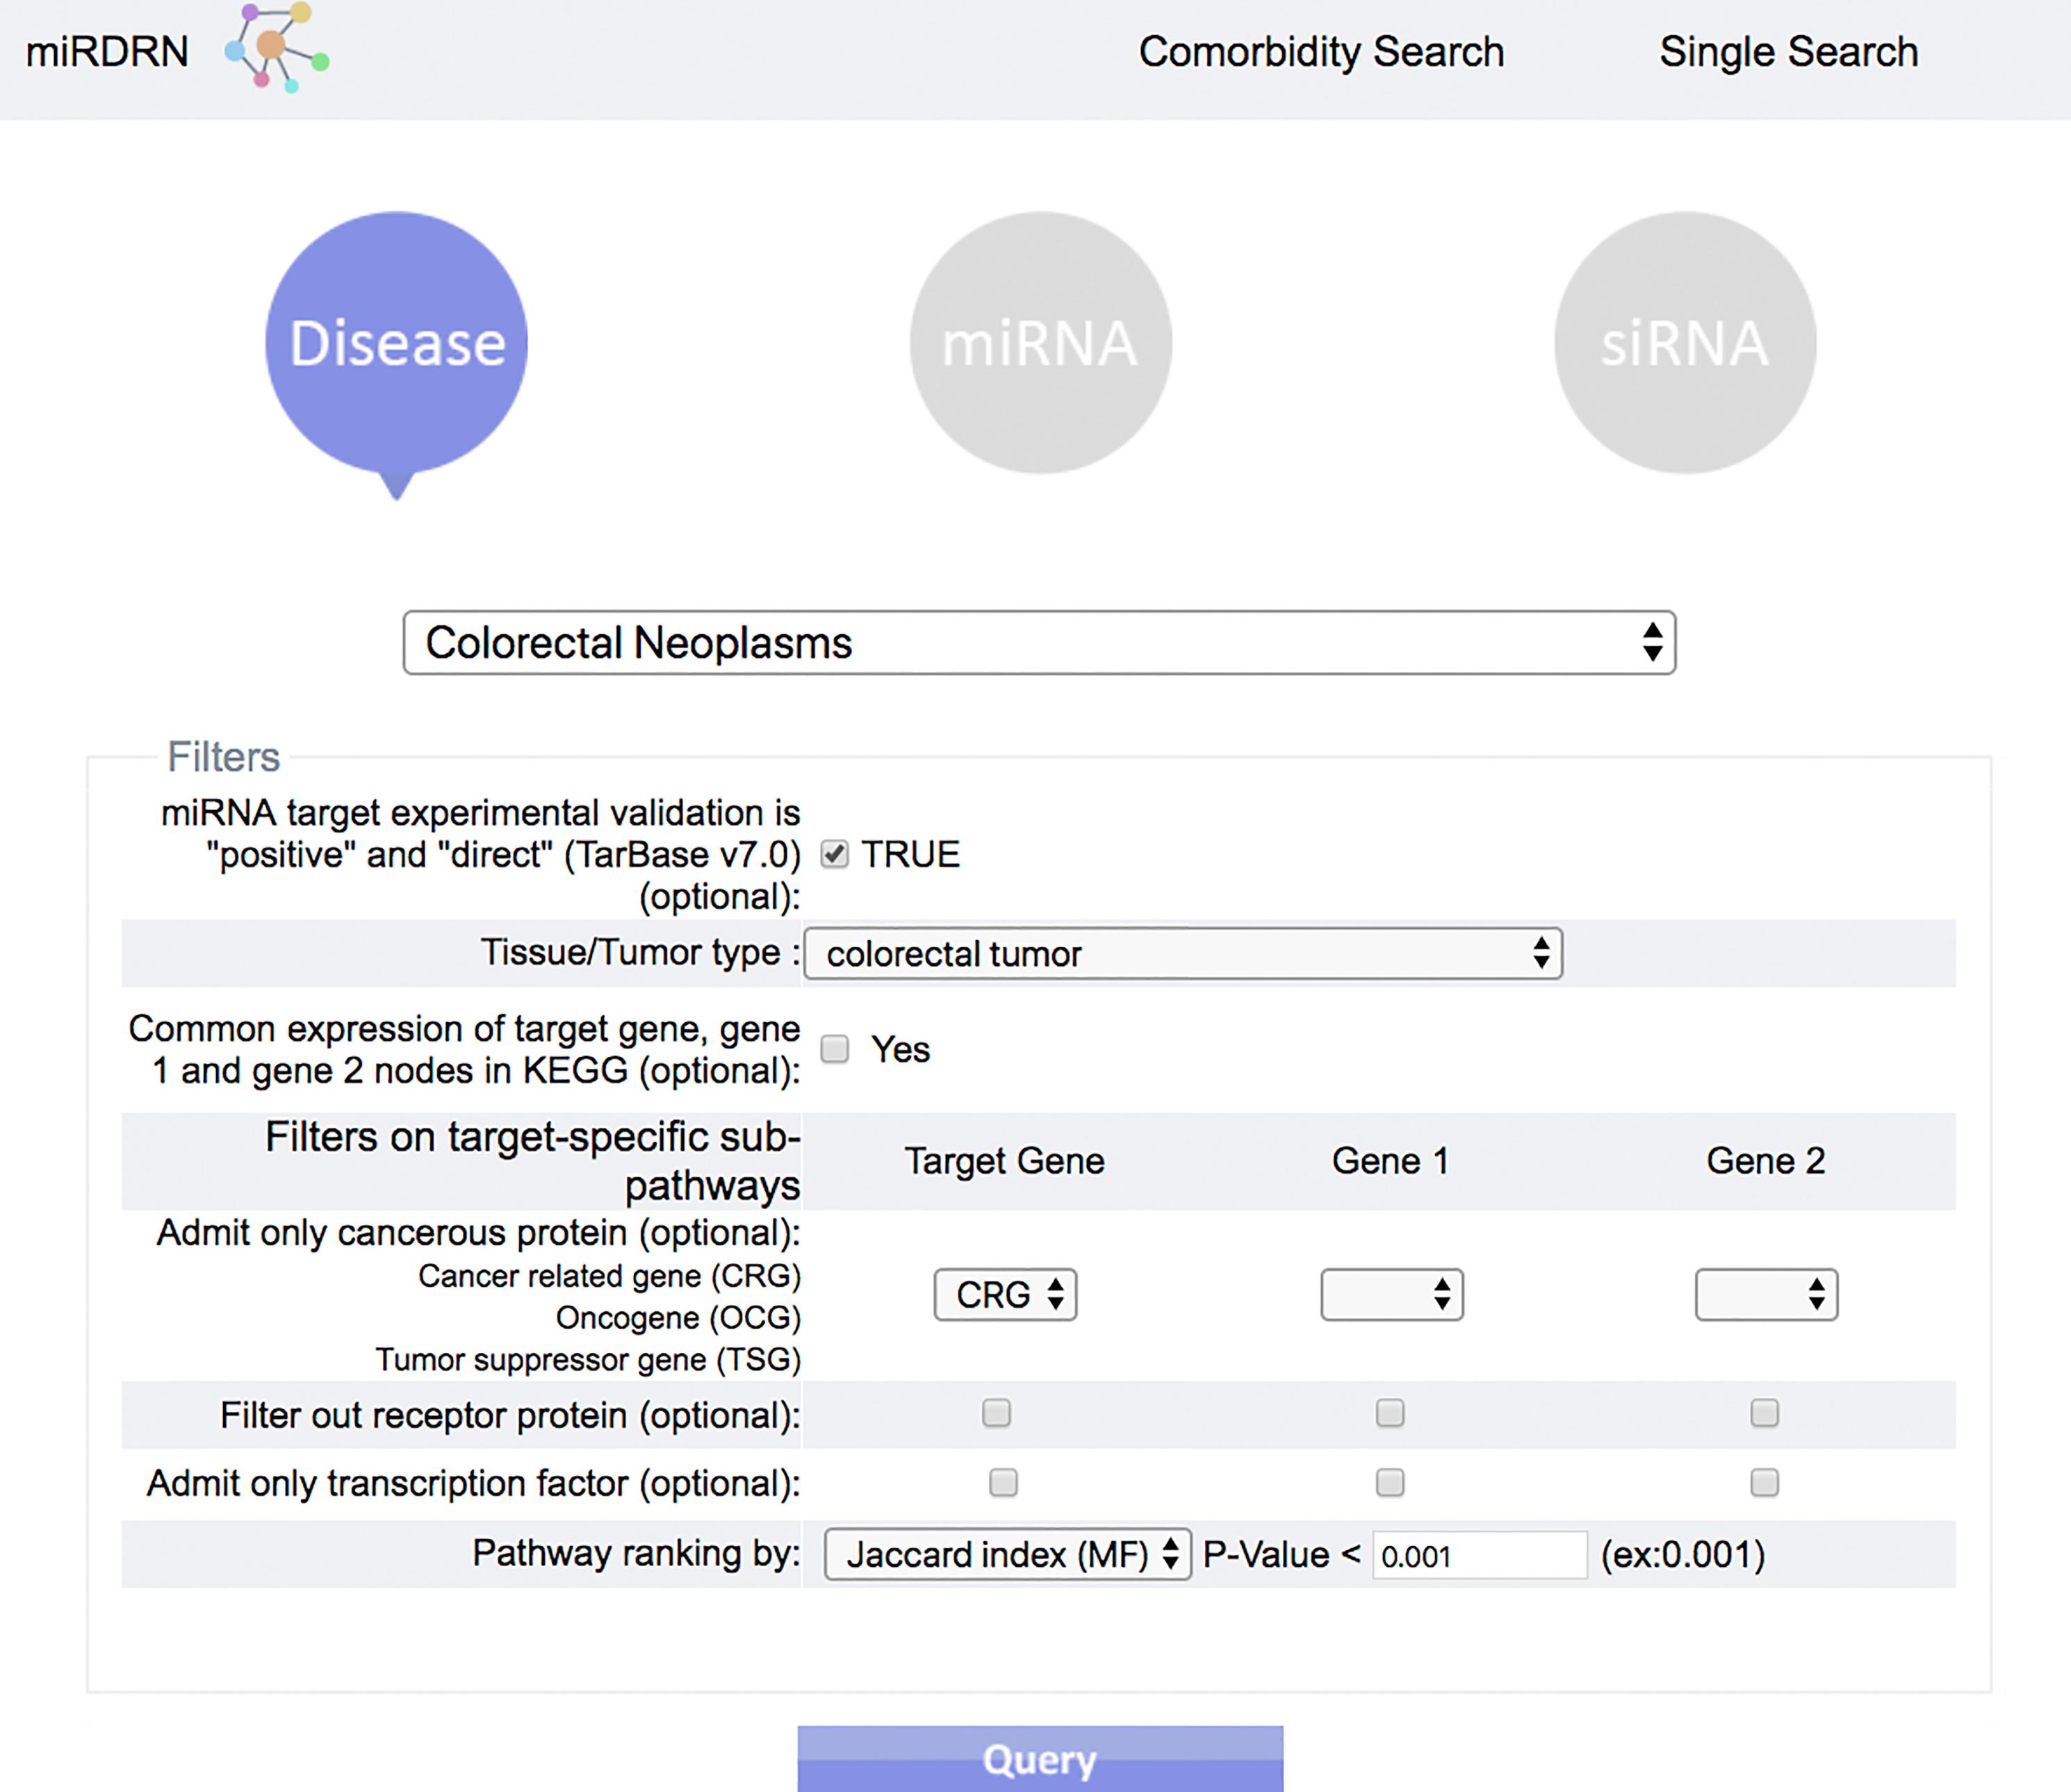 miRDRN—miRNA disease regulatory network: a tool for